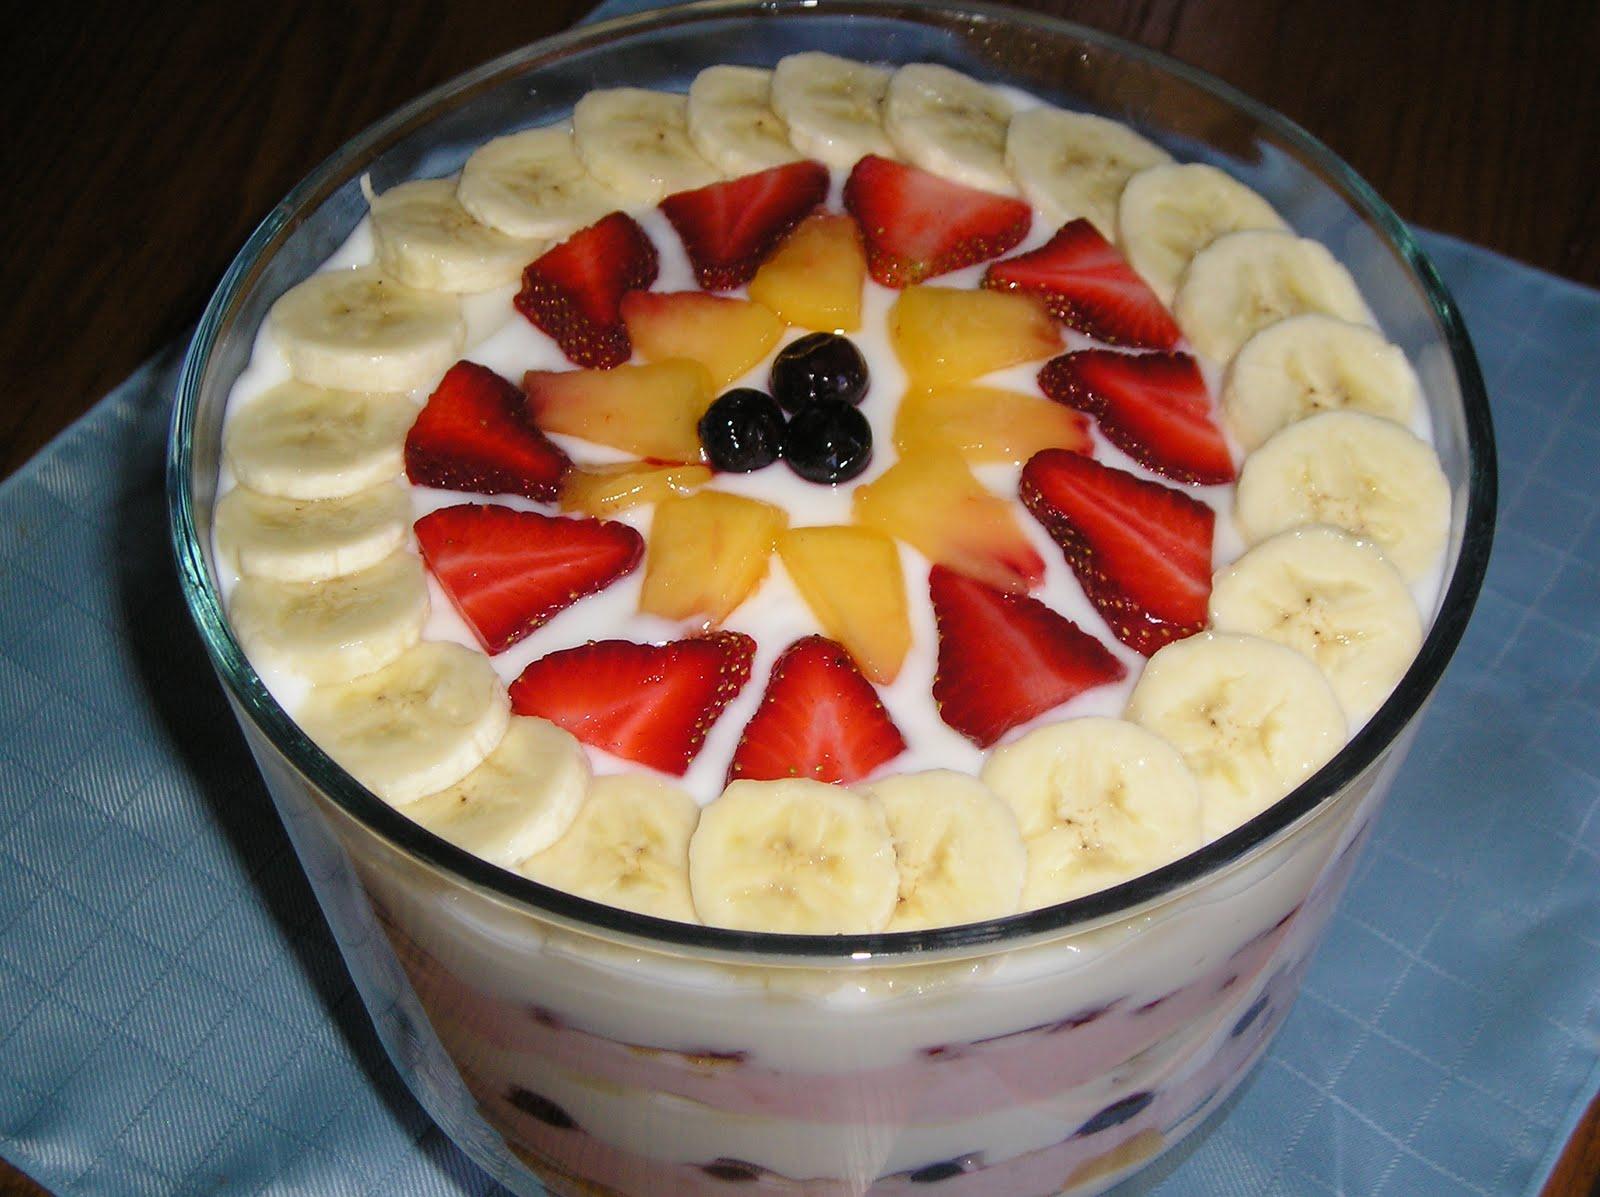 Fruit And Yogurt Parfait For A Crowd